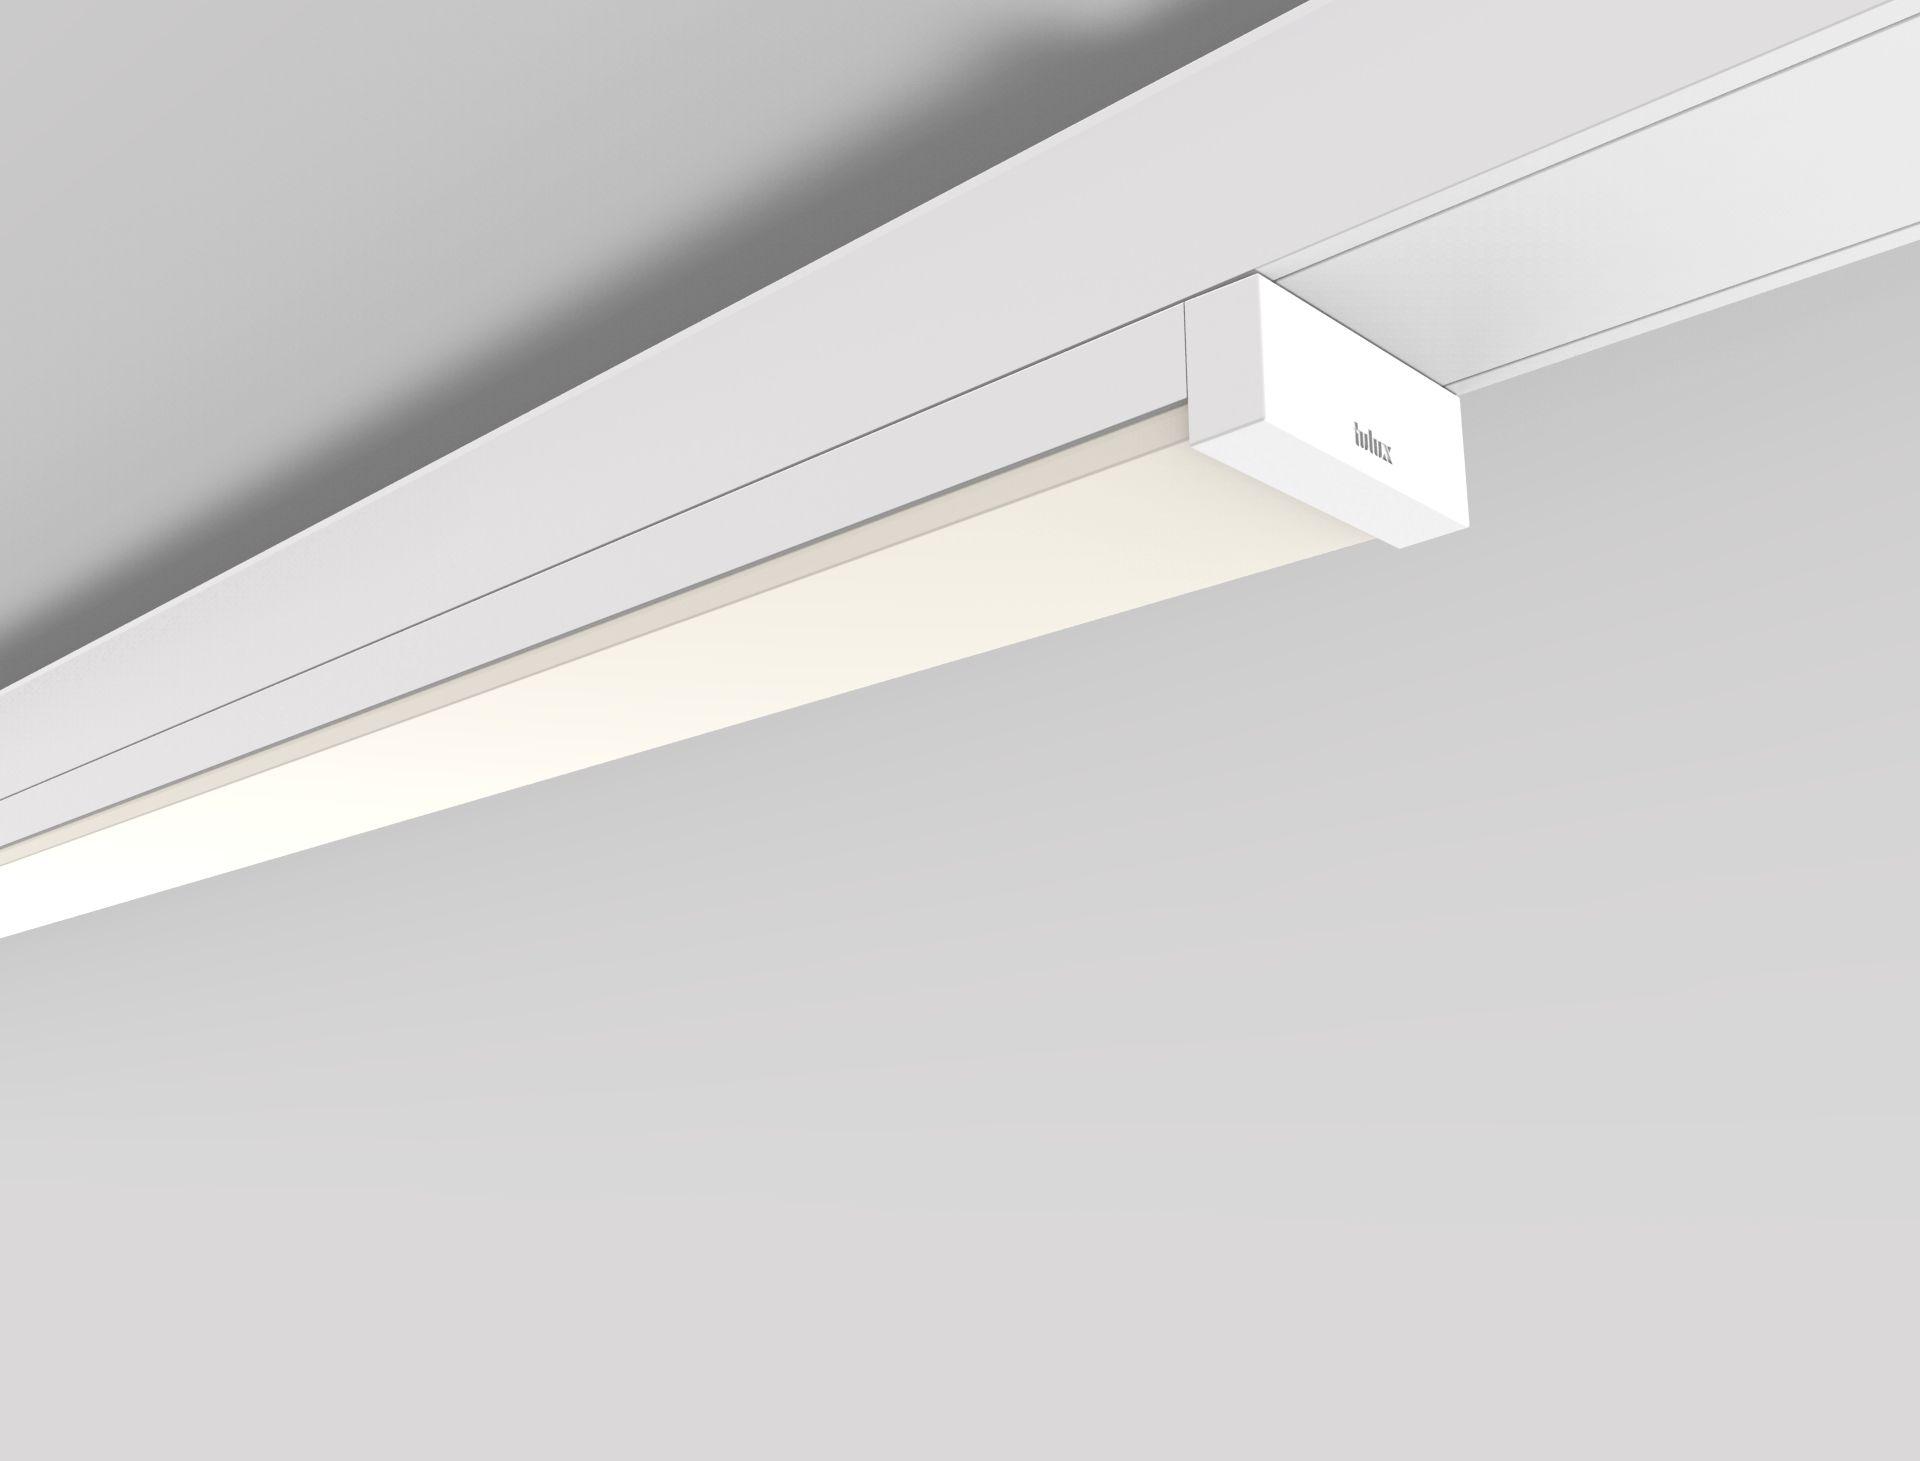 Tulux Turbo Led Light Decor Lighting